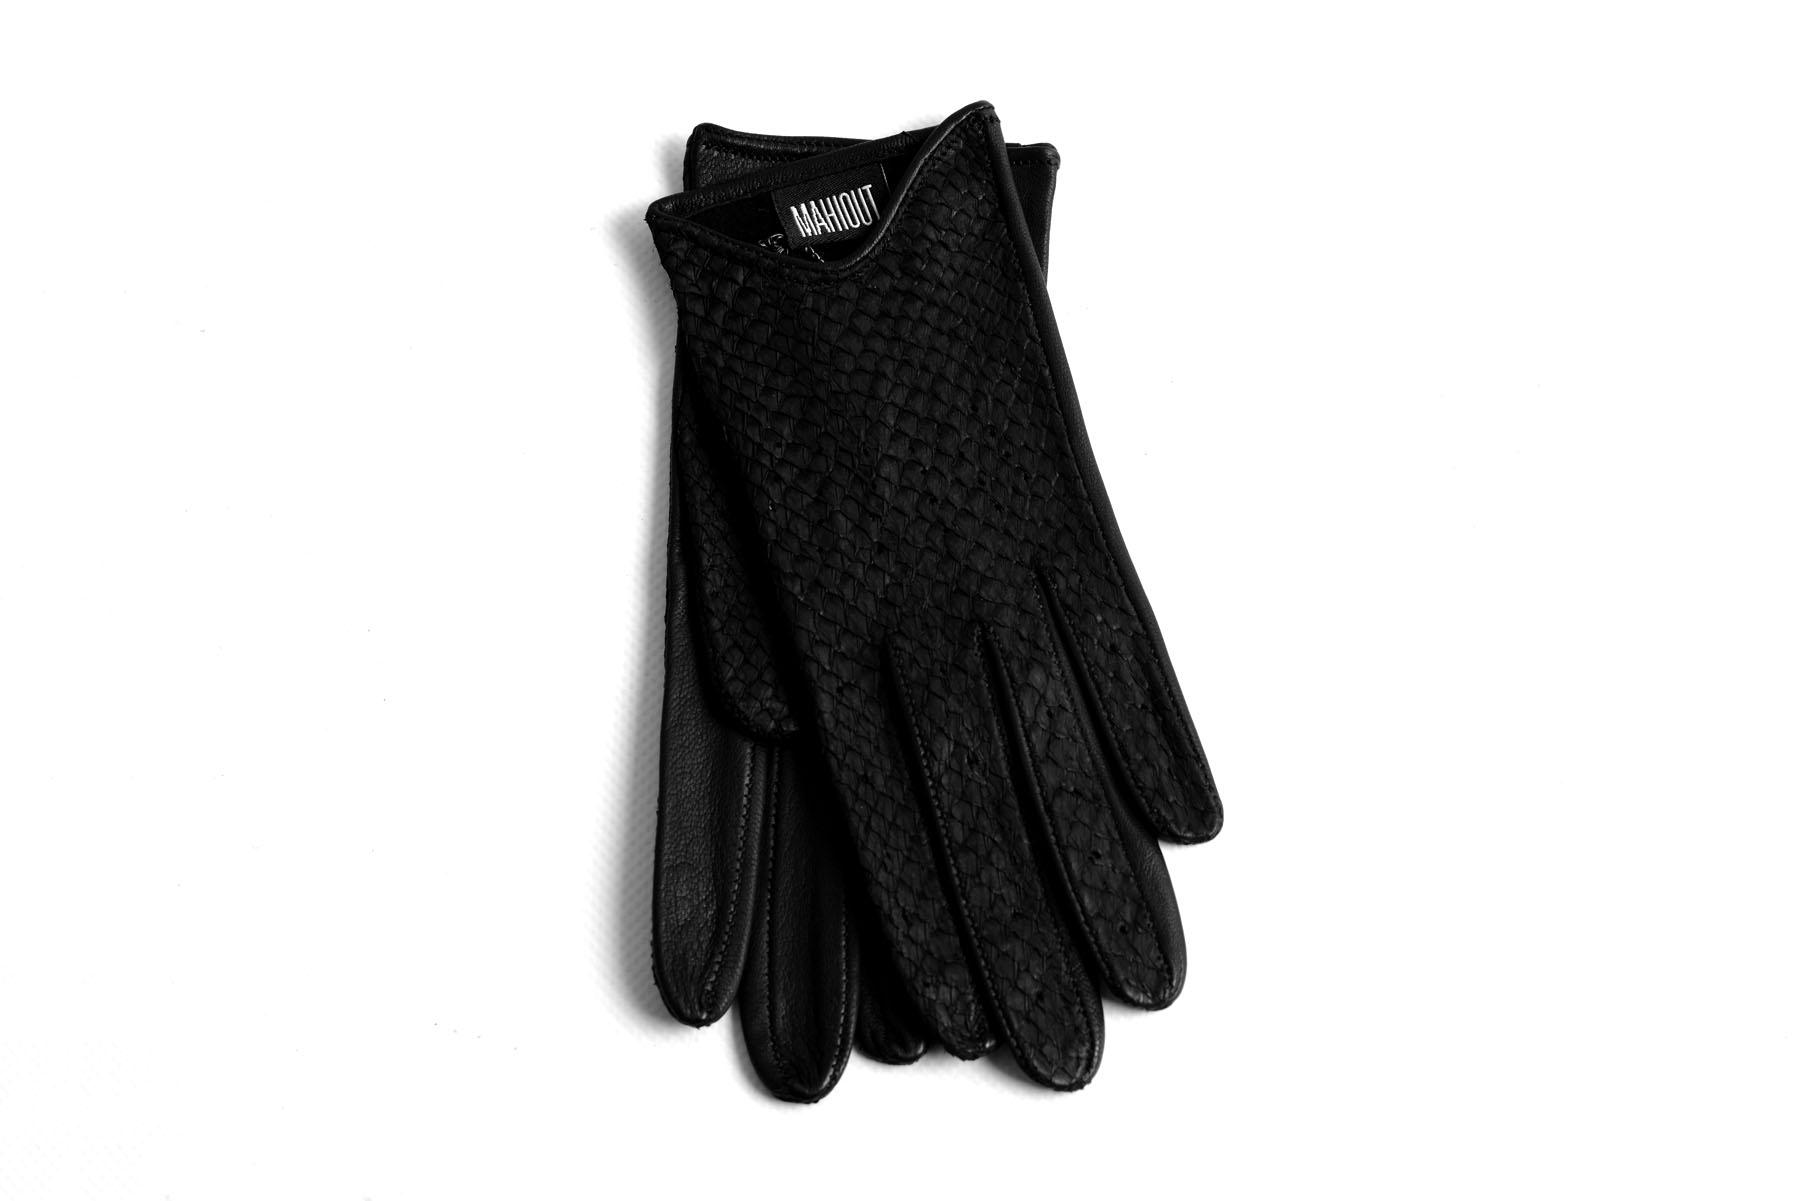 Mahiout Italian gloves in salmon skin